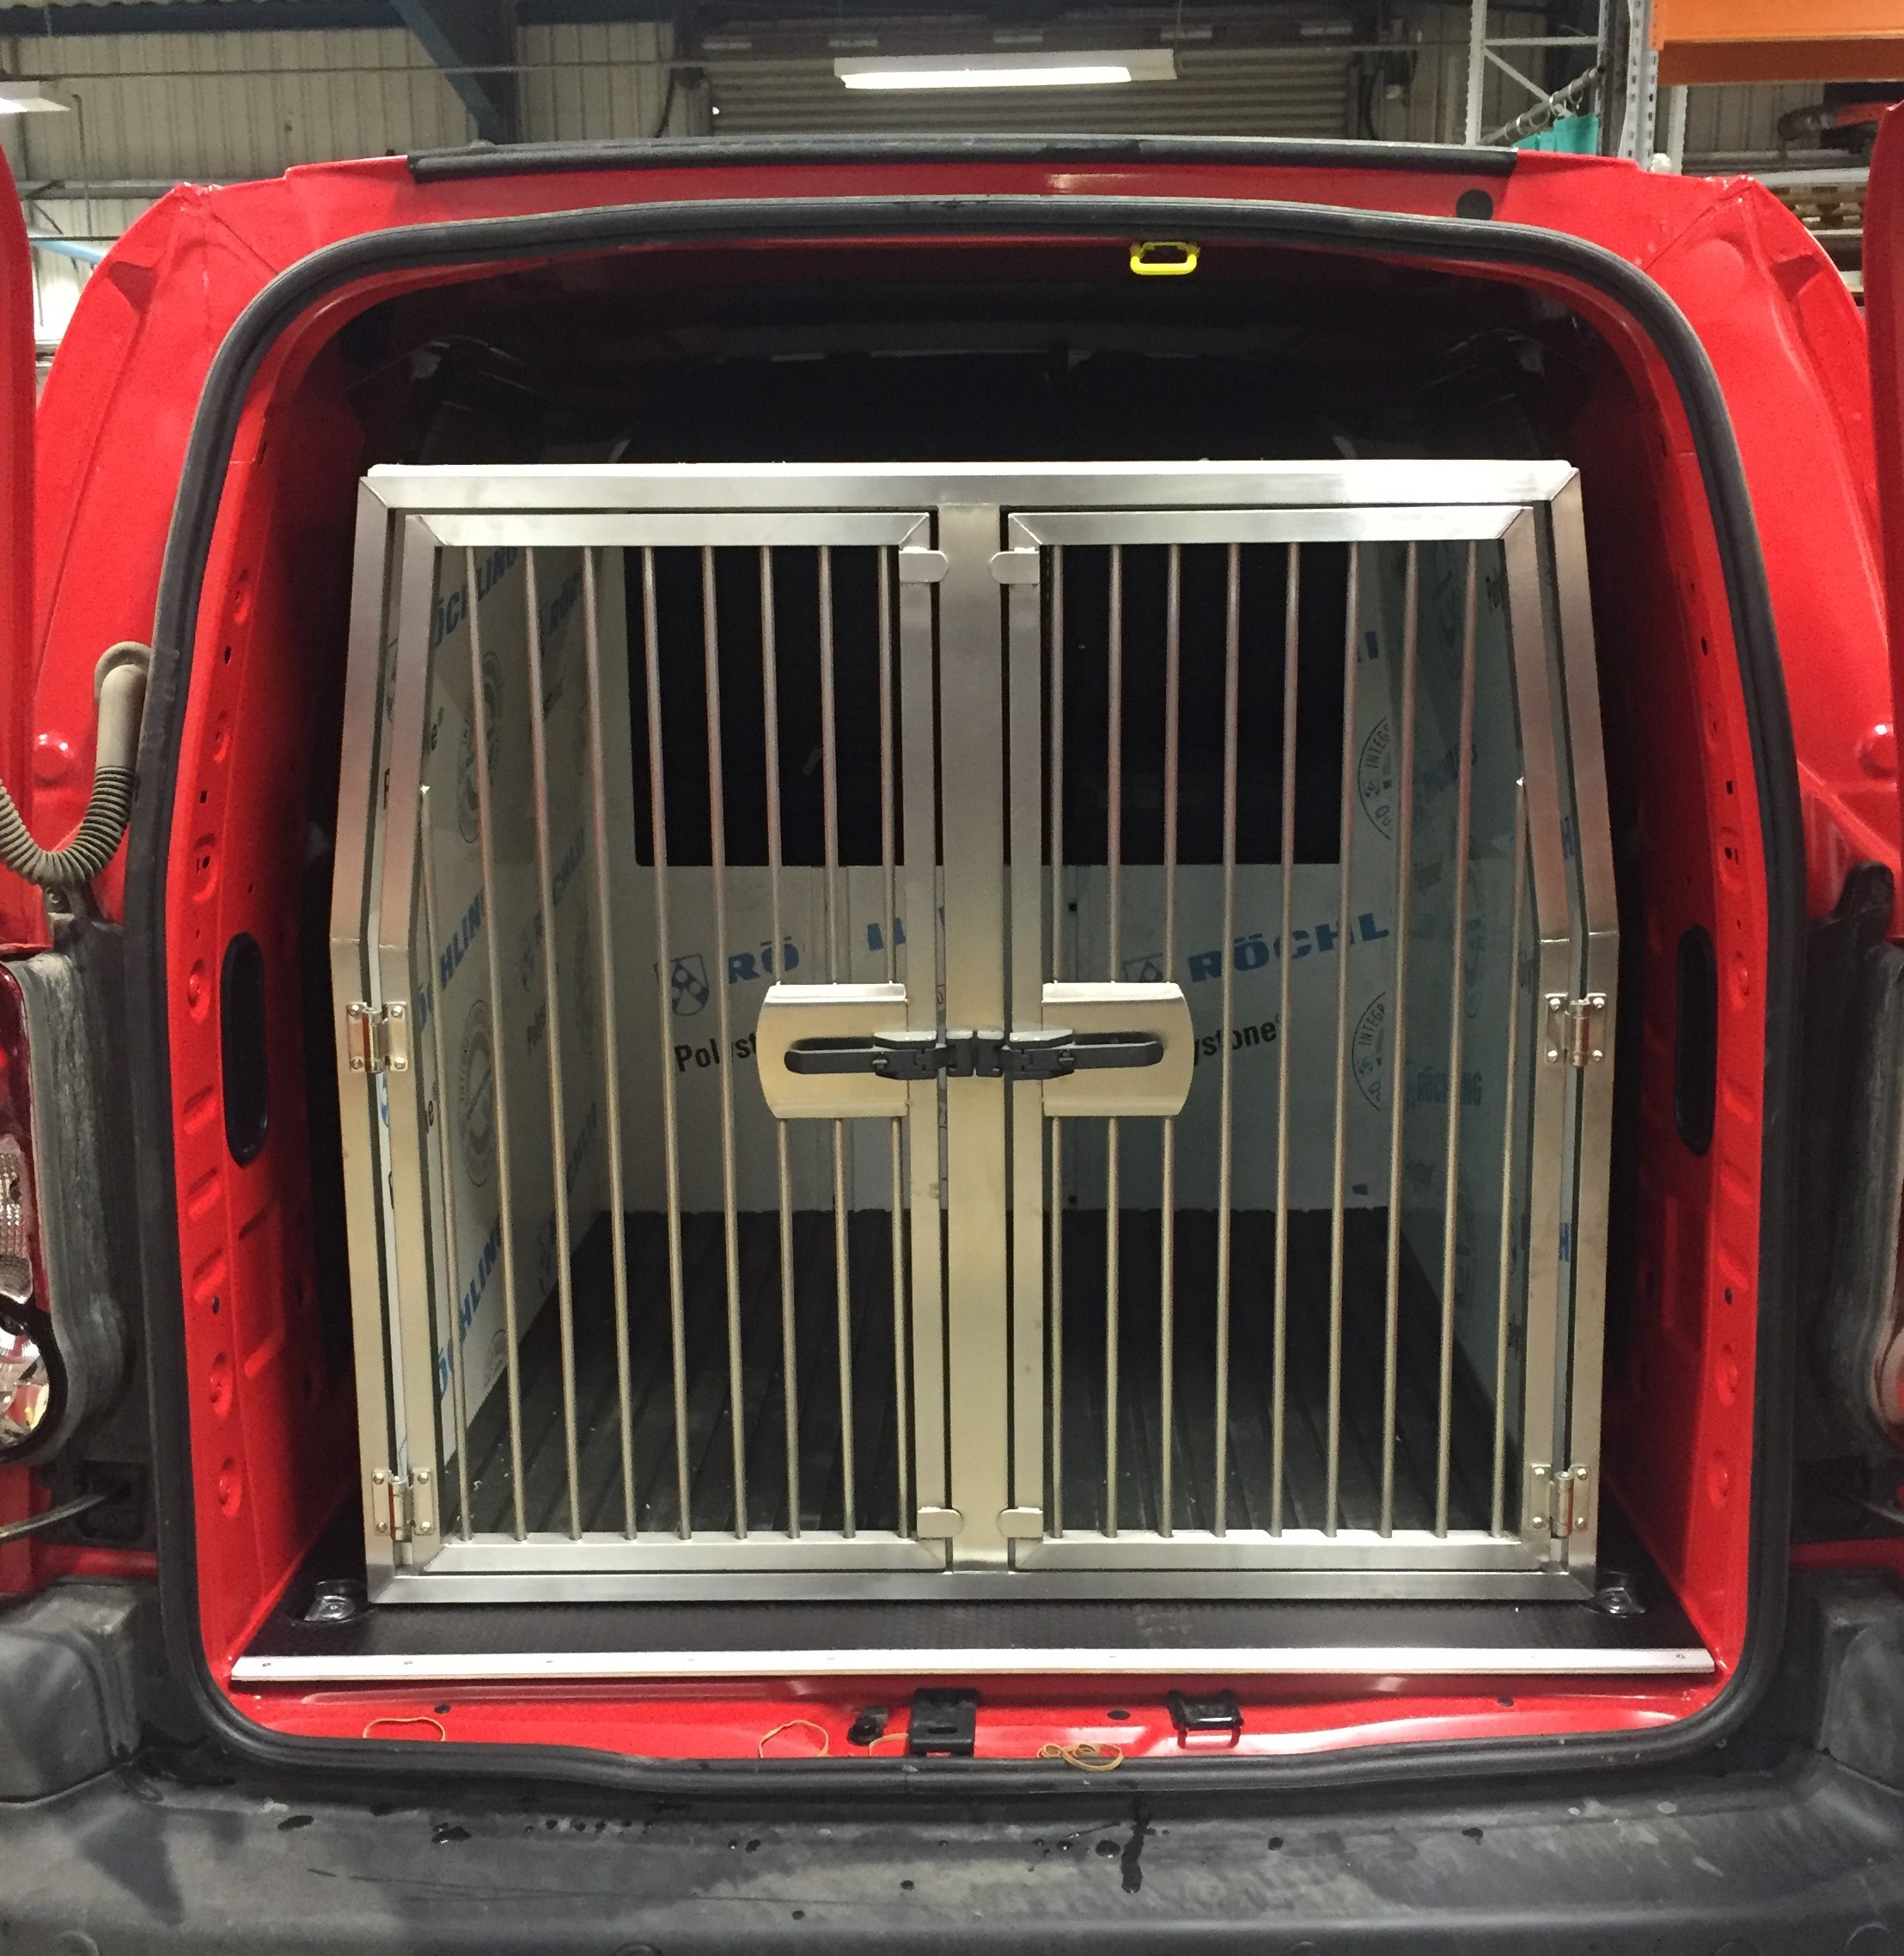 Two kennel removable dog pod in Peugeot Partner